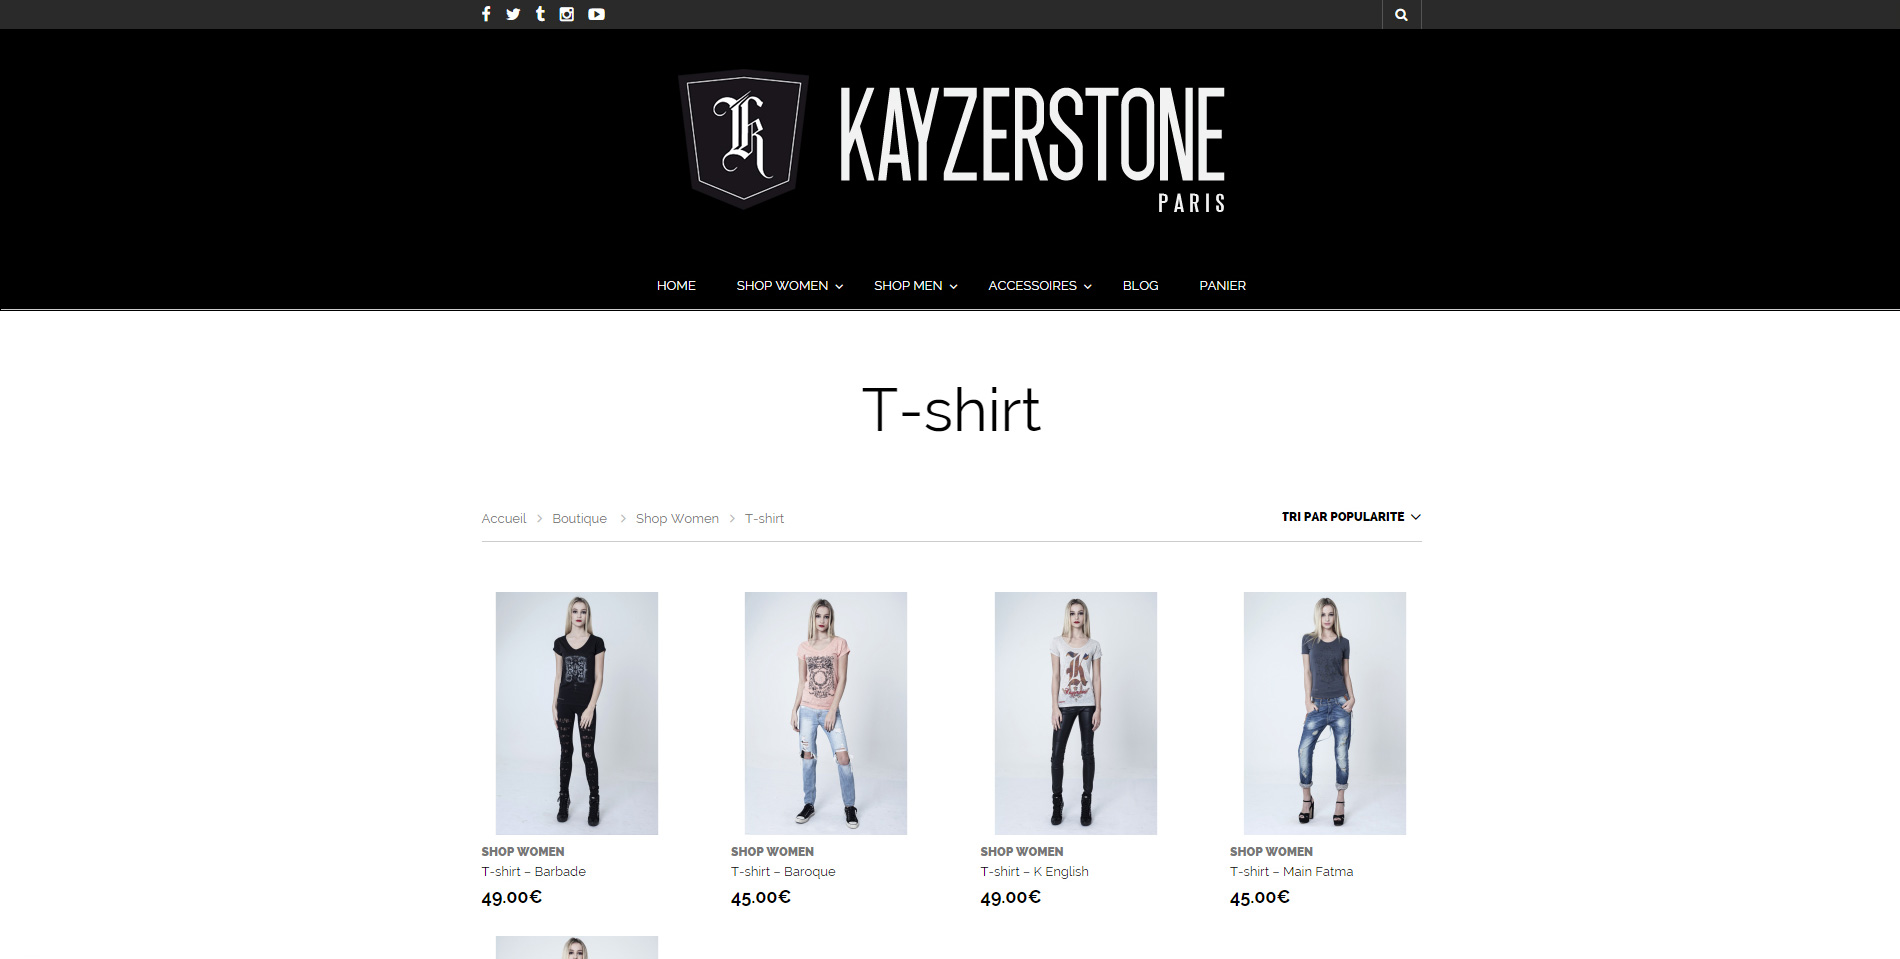 Kayzerstone - Listing de produits